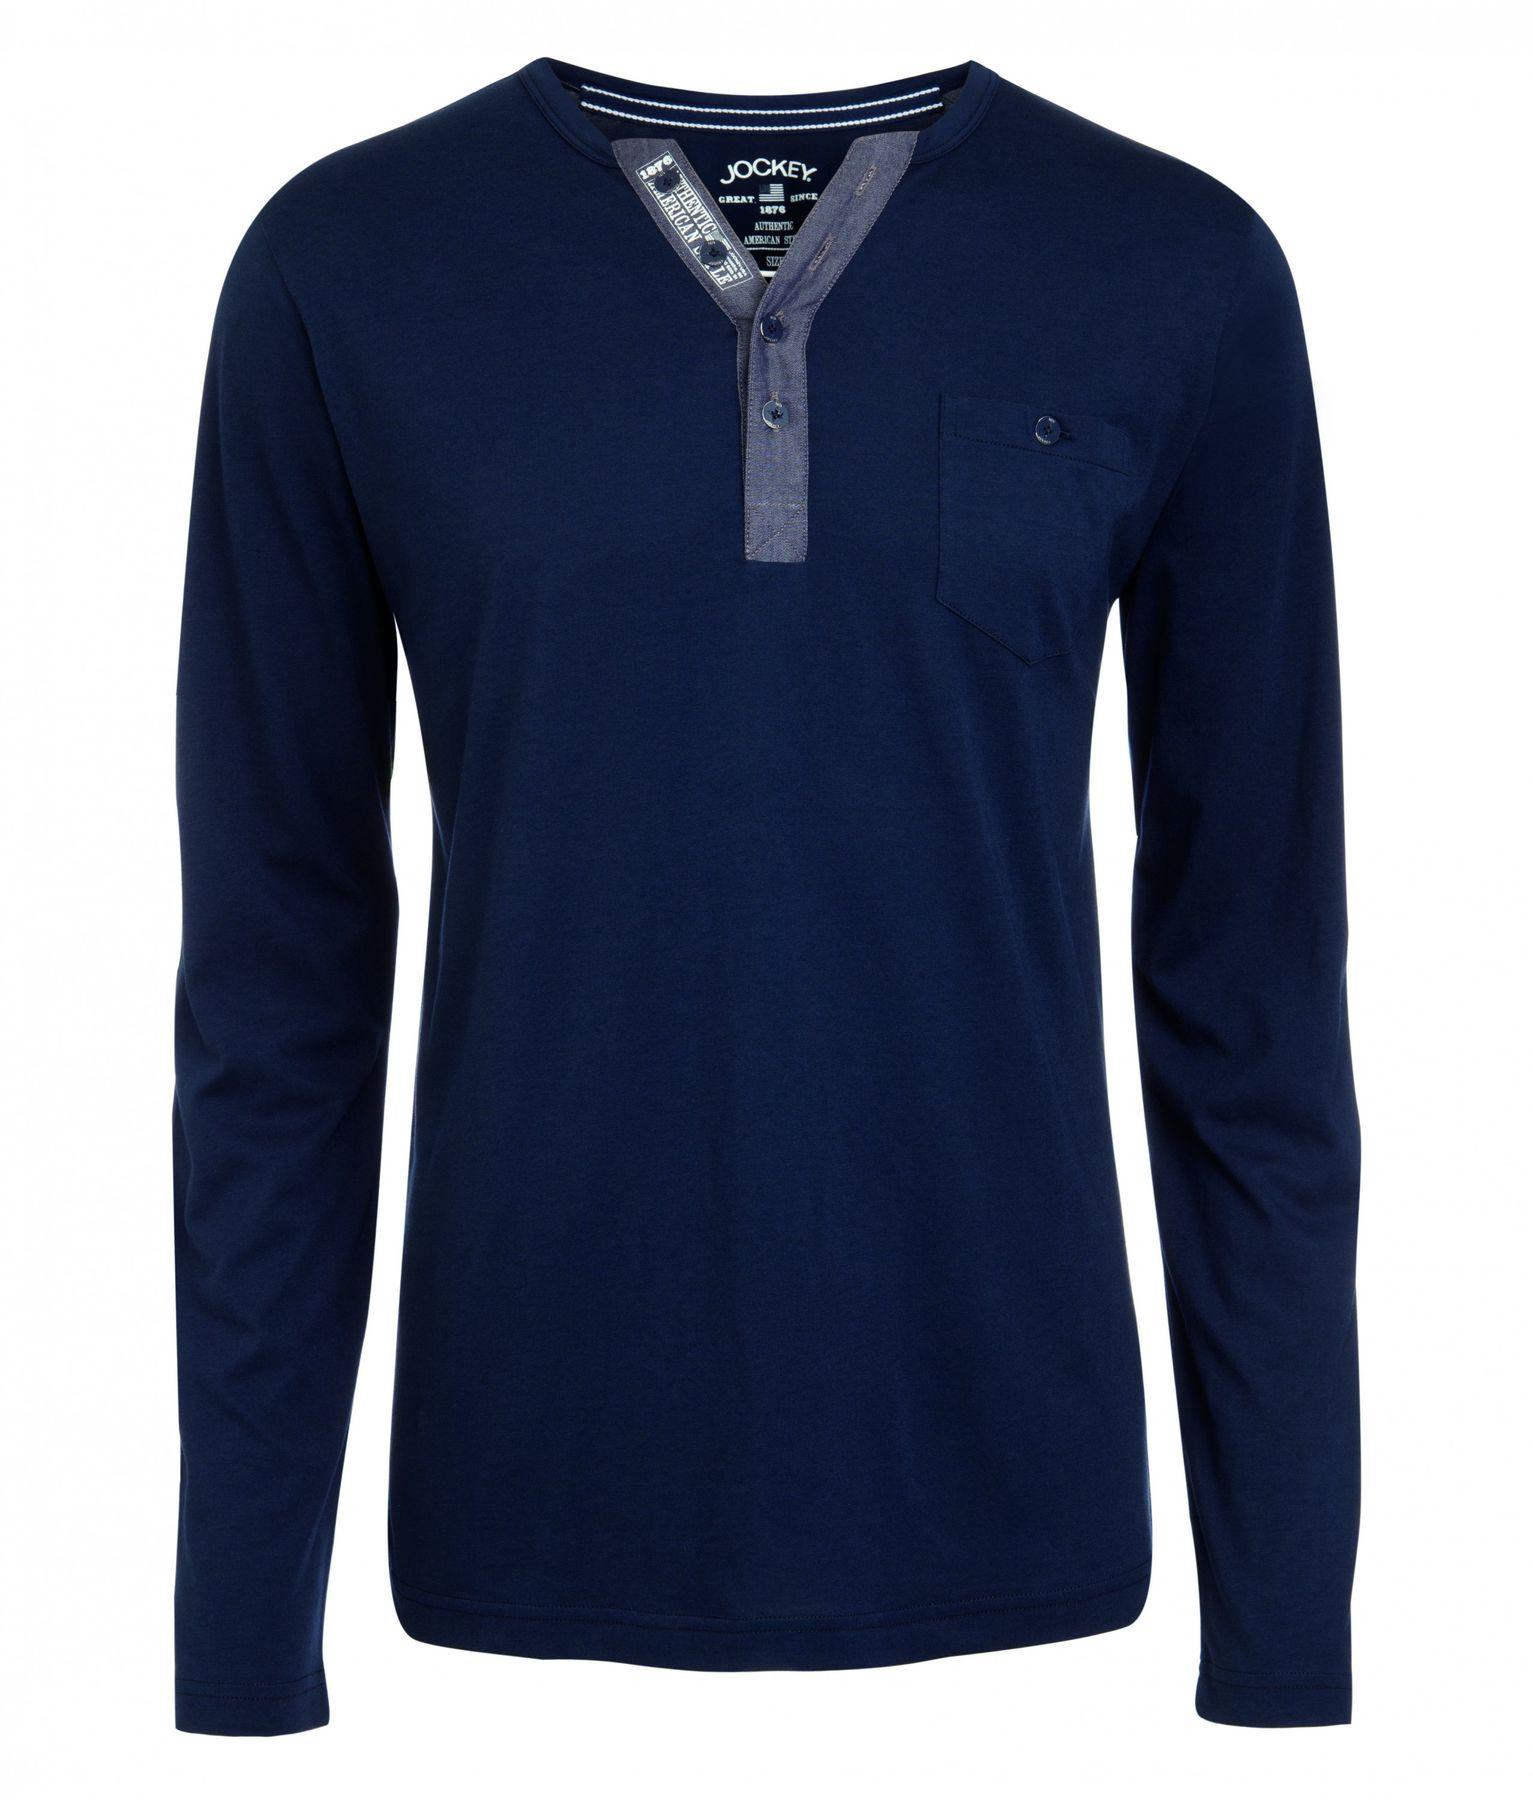 Jockey - Herren Shirt, Langarm (500702H) – Bild 1